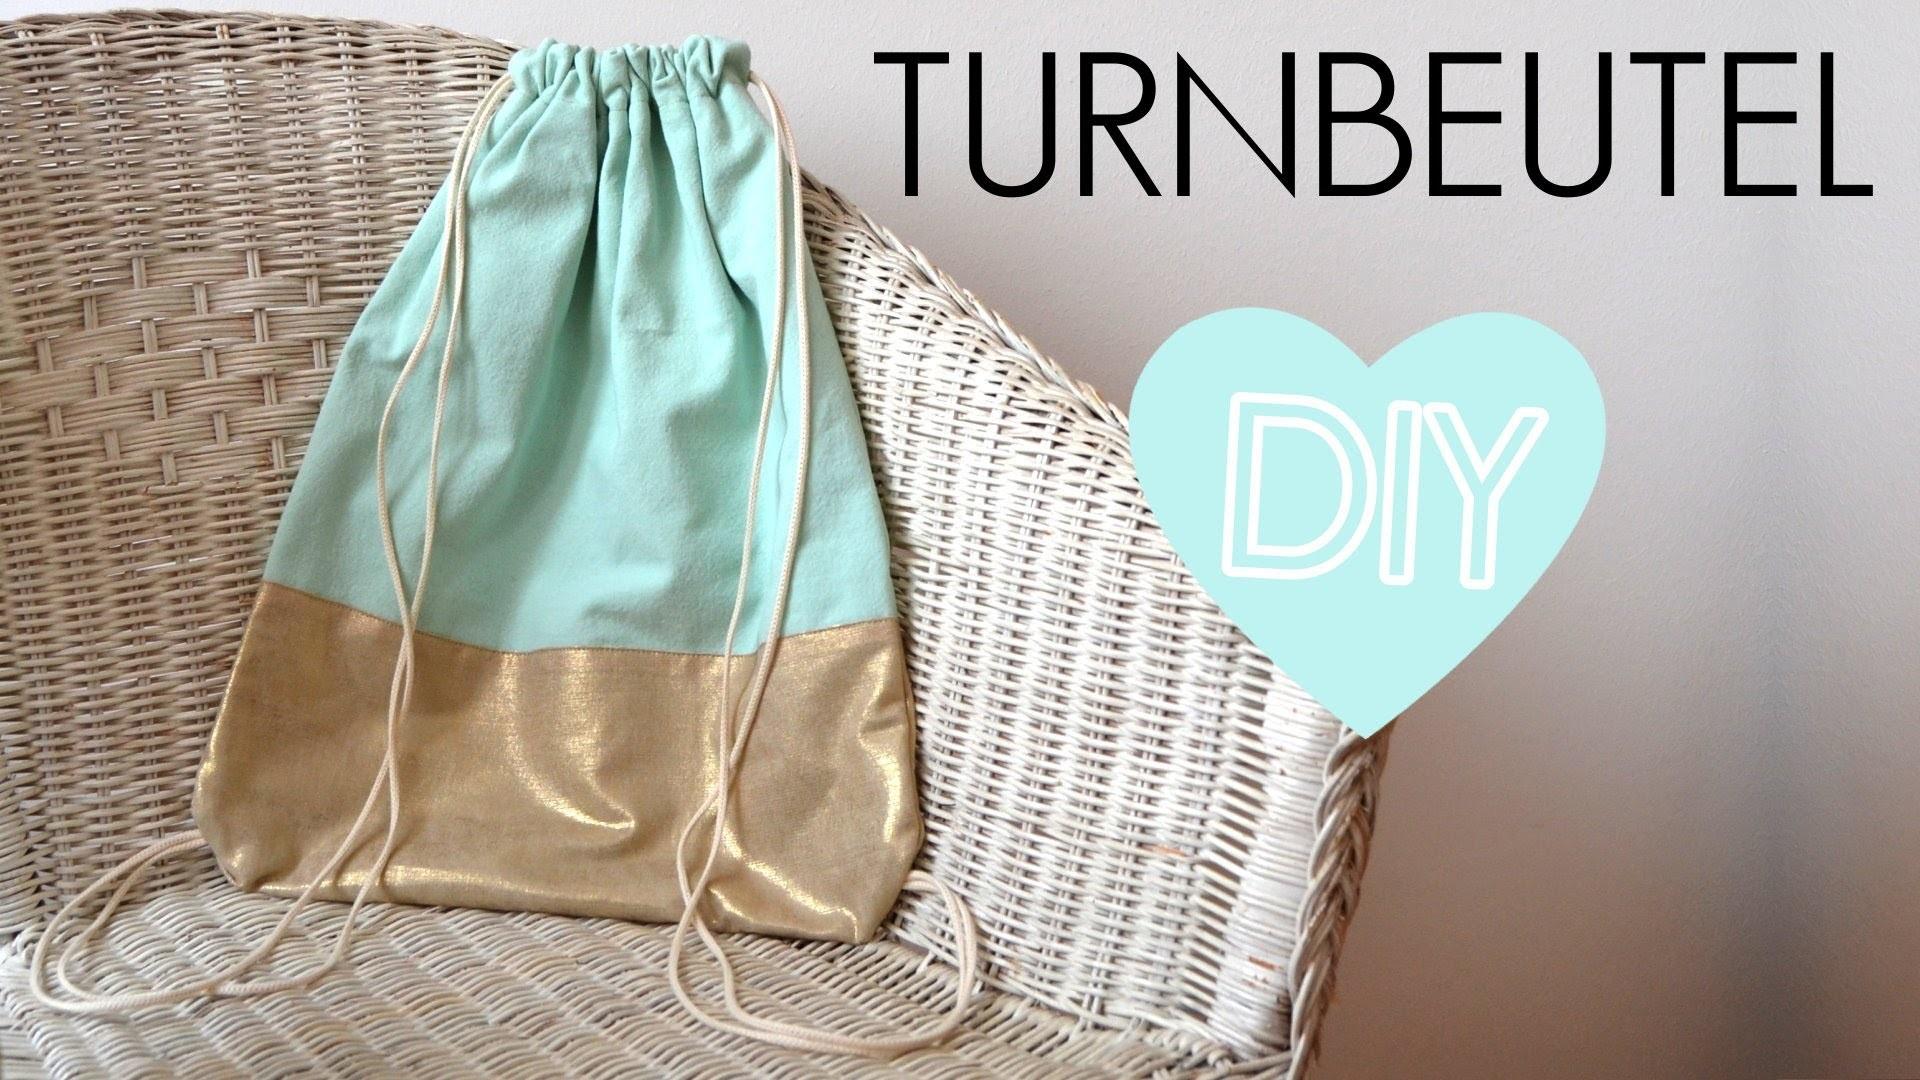 diy anleitung turnbeutel rucksack einfach selber machen n hen f r anf nger. Black Bedroom Furniture Sets. Home Design Ideas